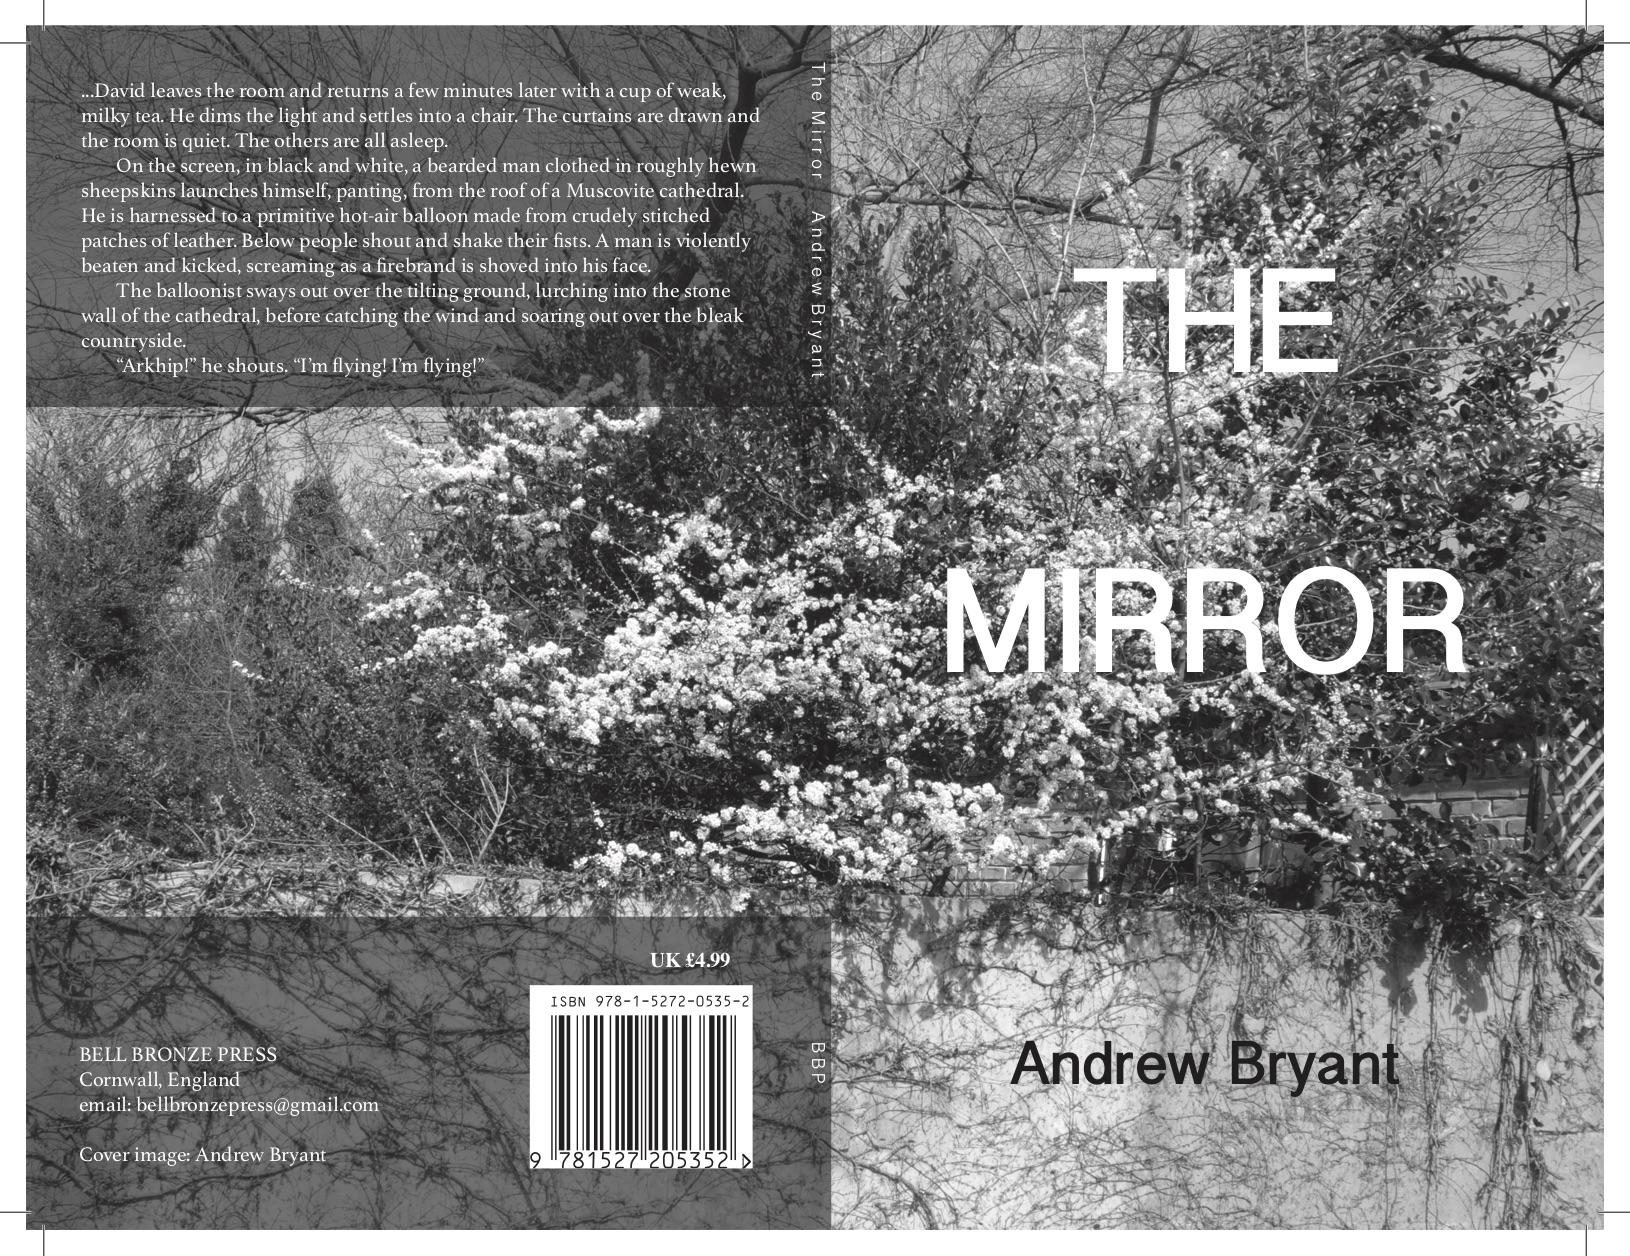 ab-the-mirror-pback-cover-v03-grayscale-60%-shade.jpg